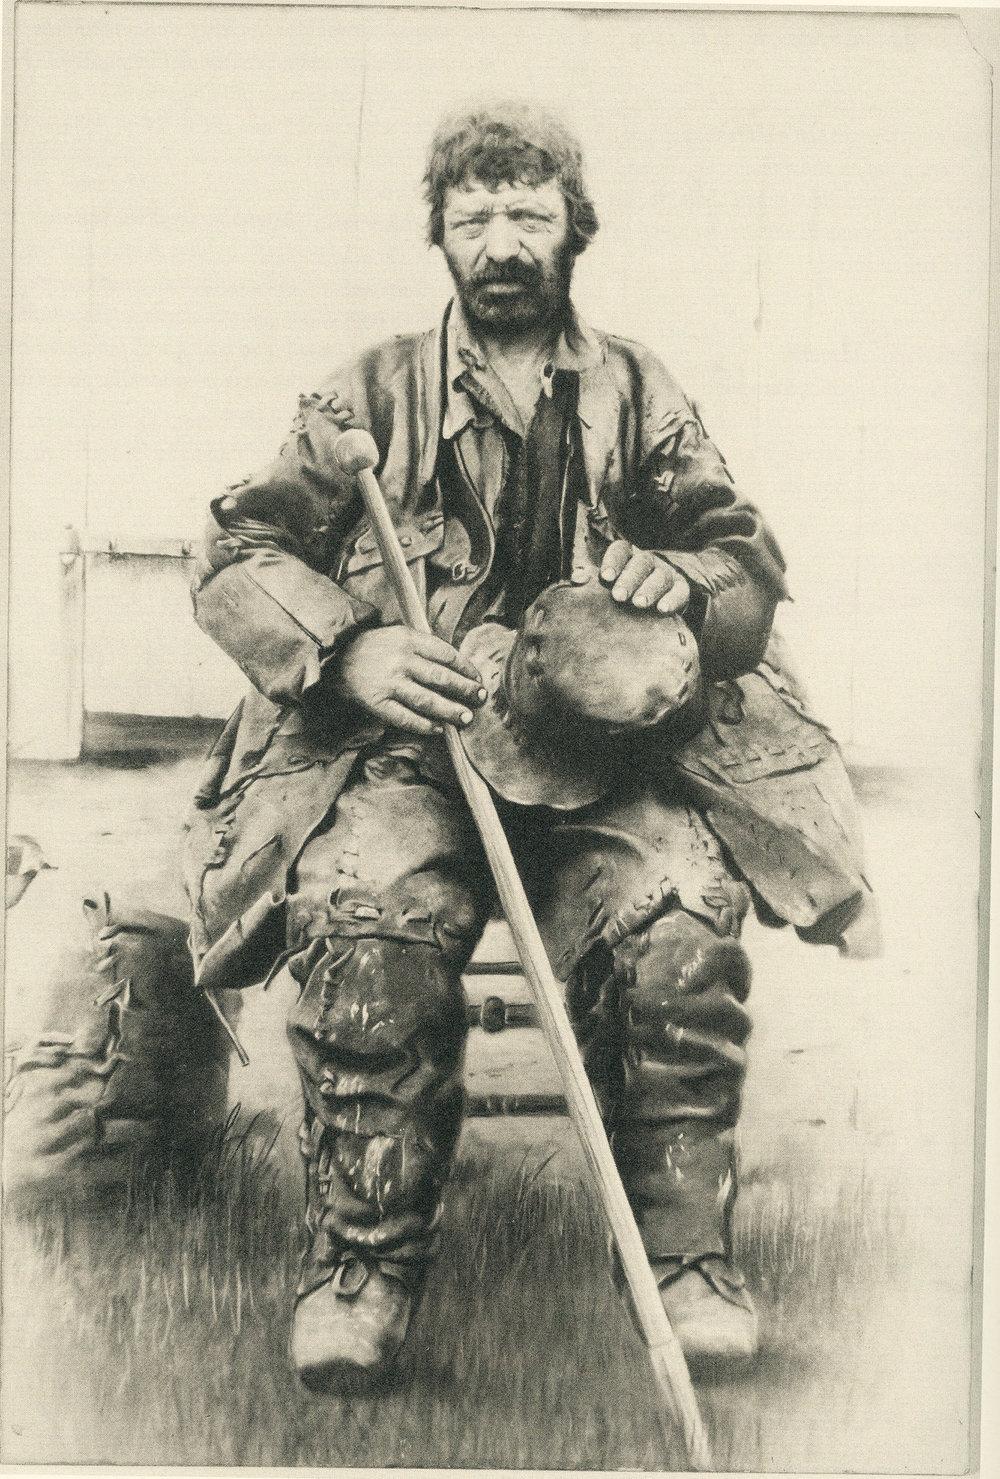 leatherman-1.jpg